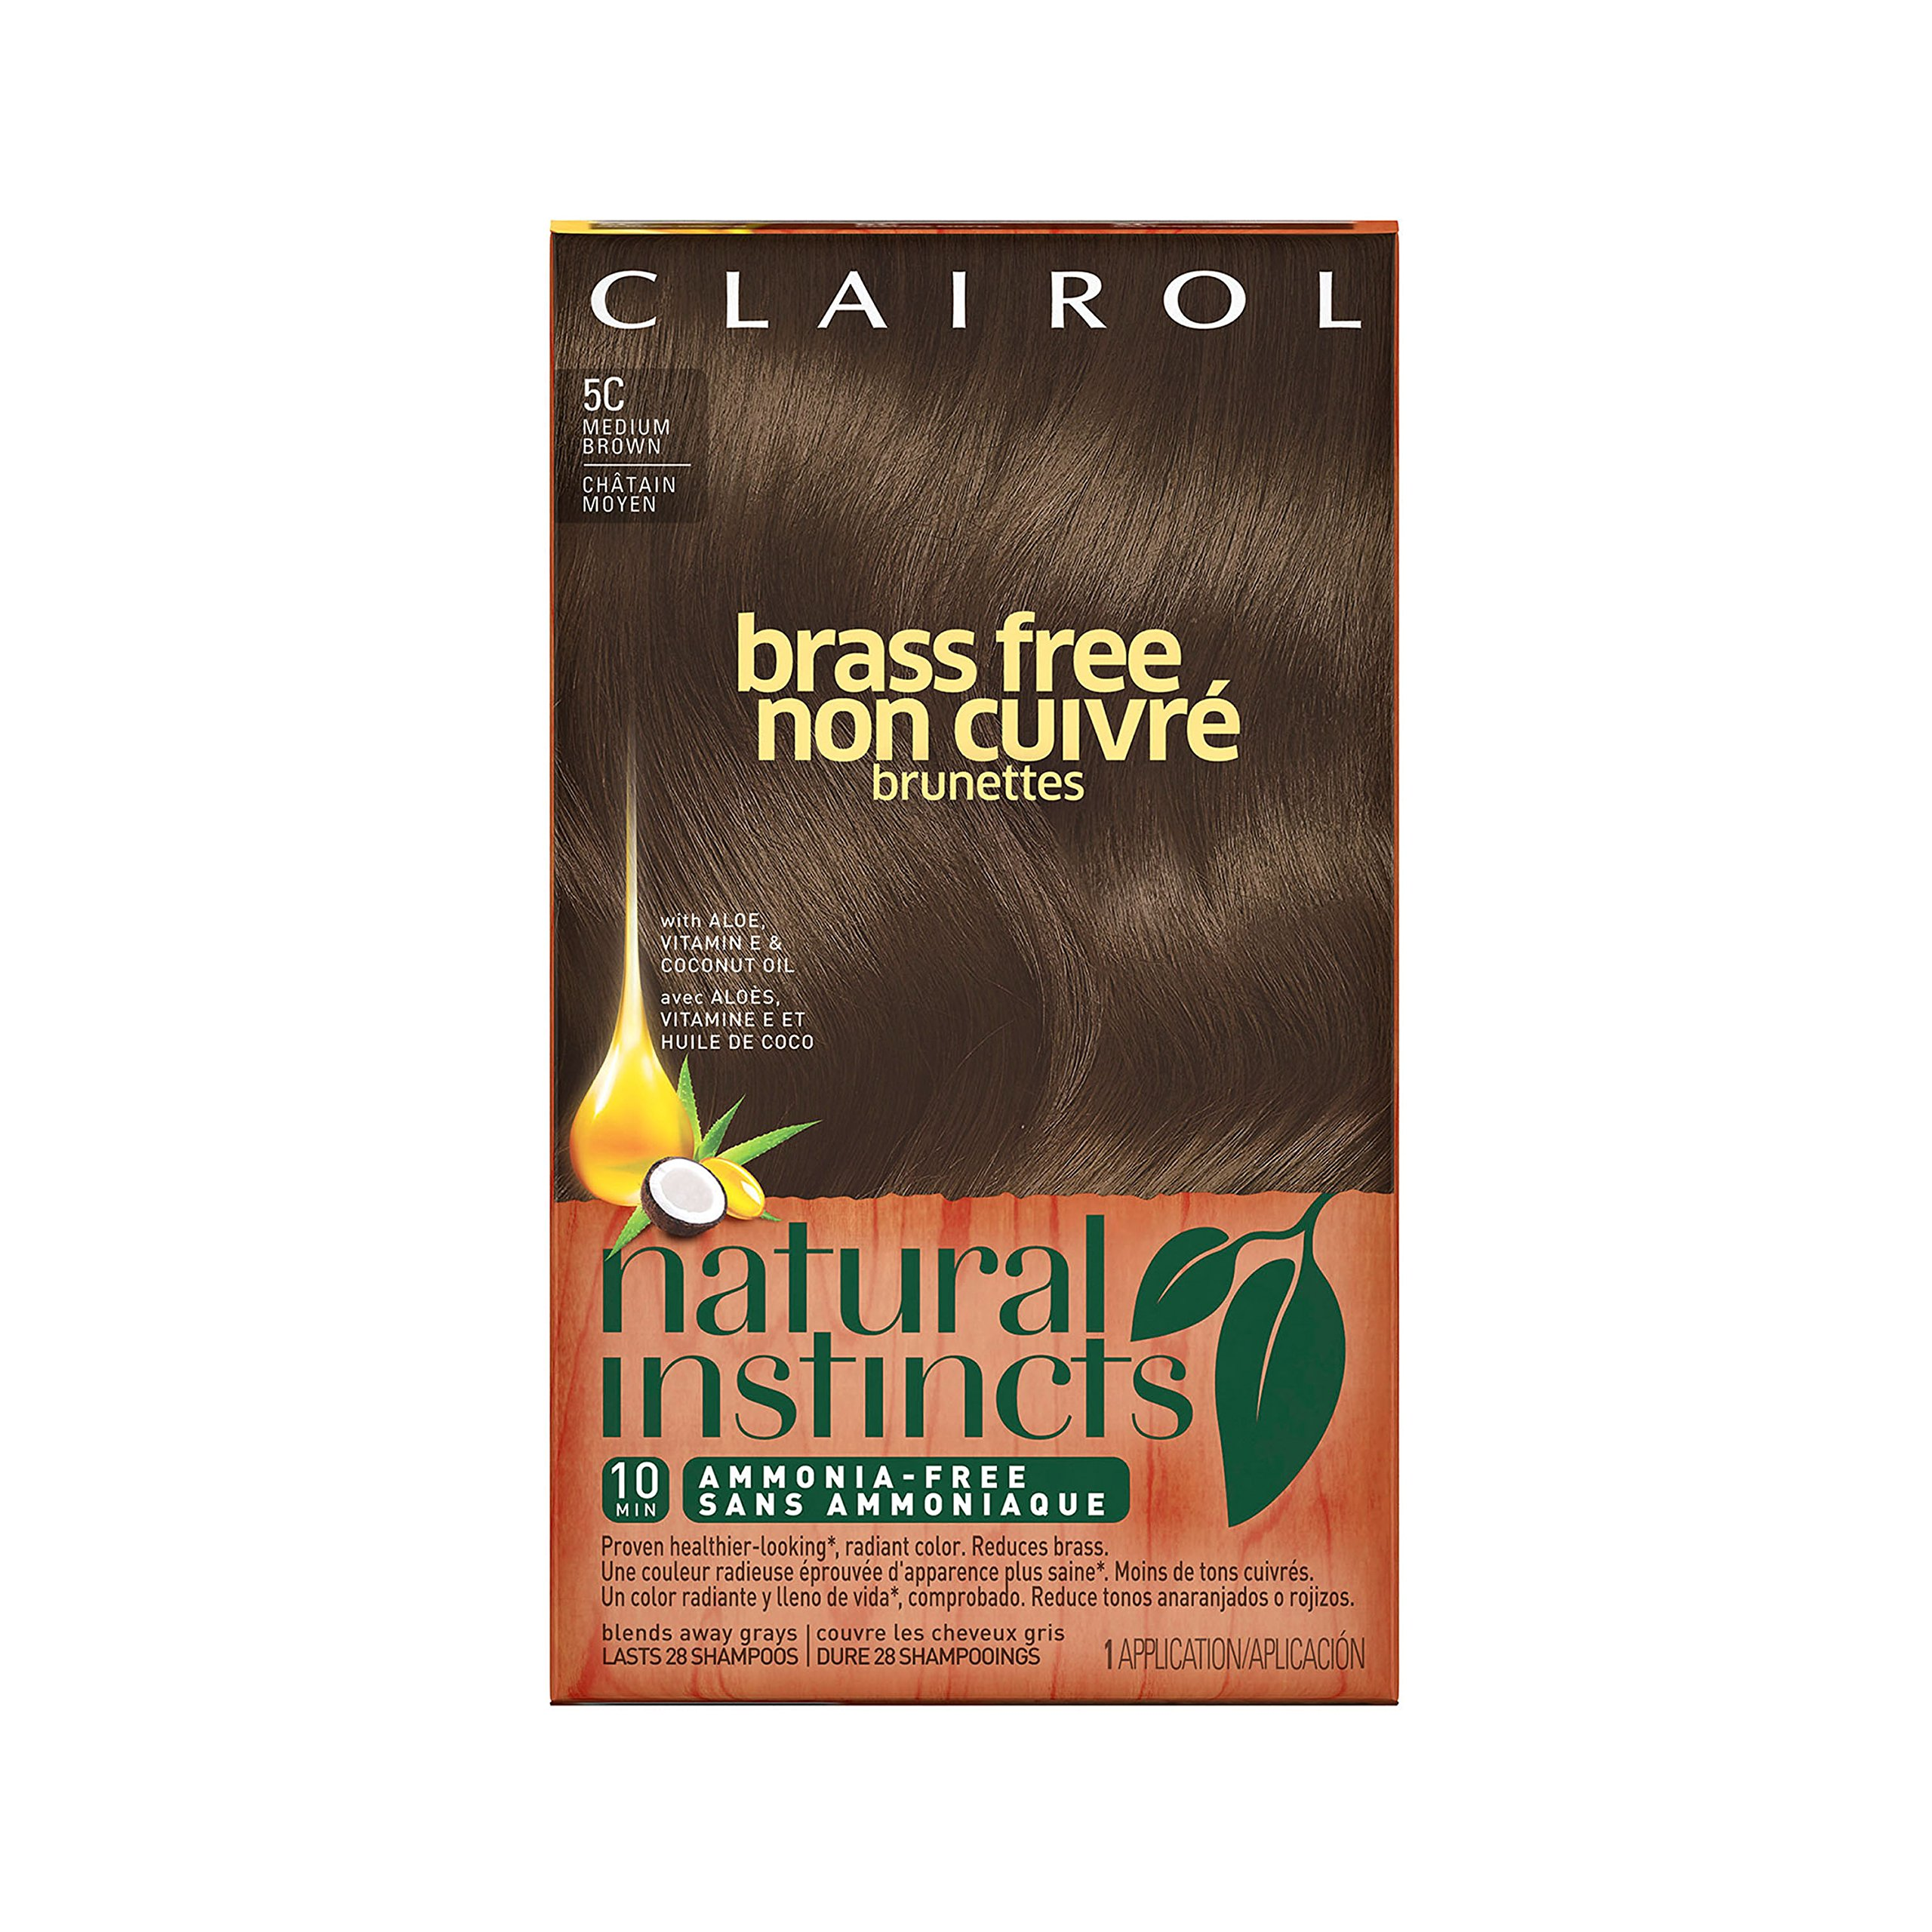 clairol natural instincts medium brown instructions